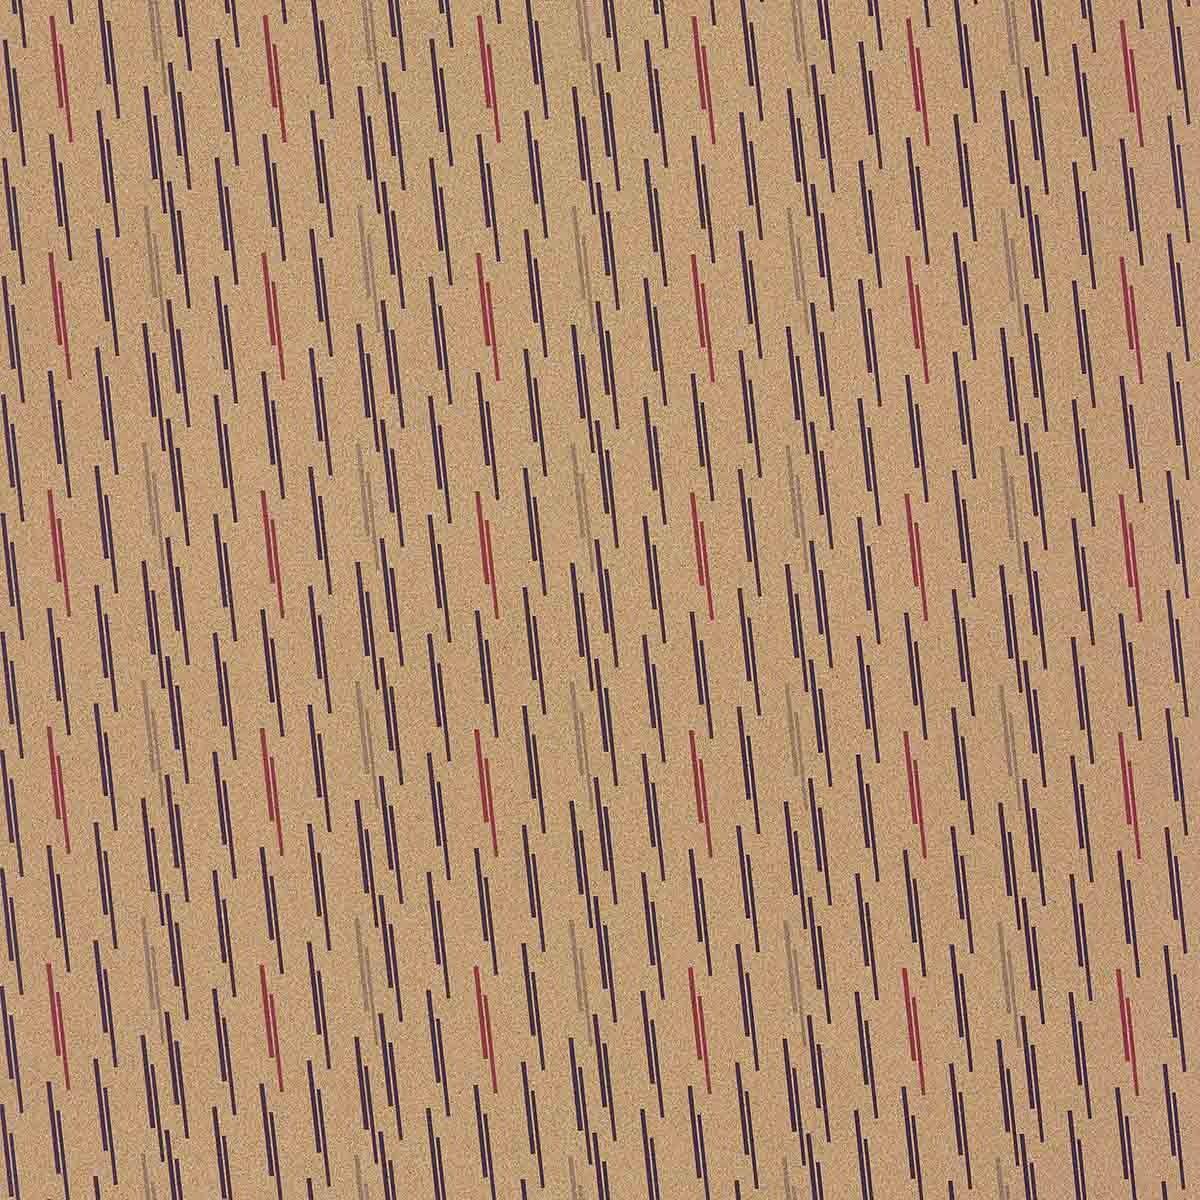 Carta da Parati in Sughero 0,5mm - Iridescence 01.02